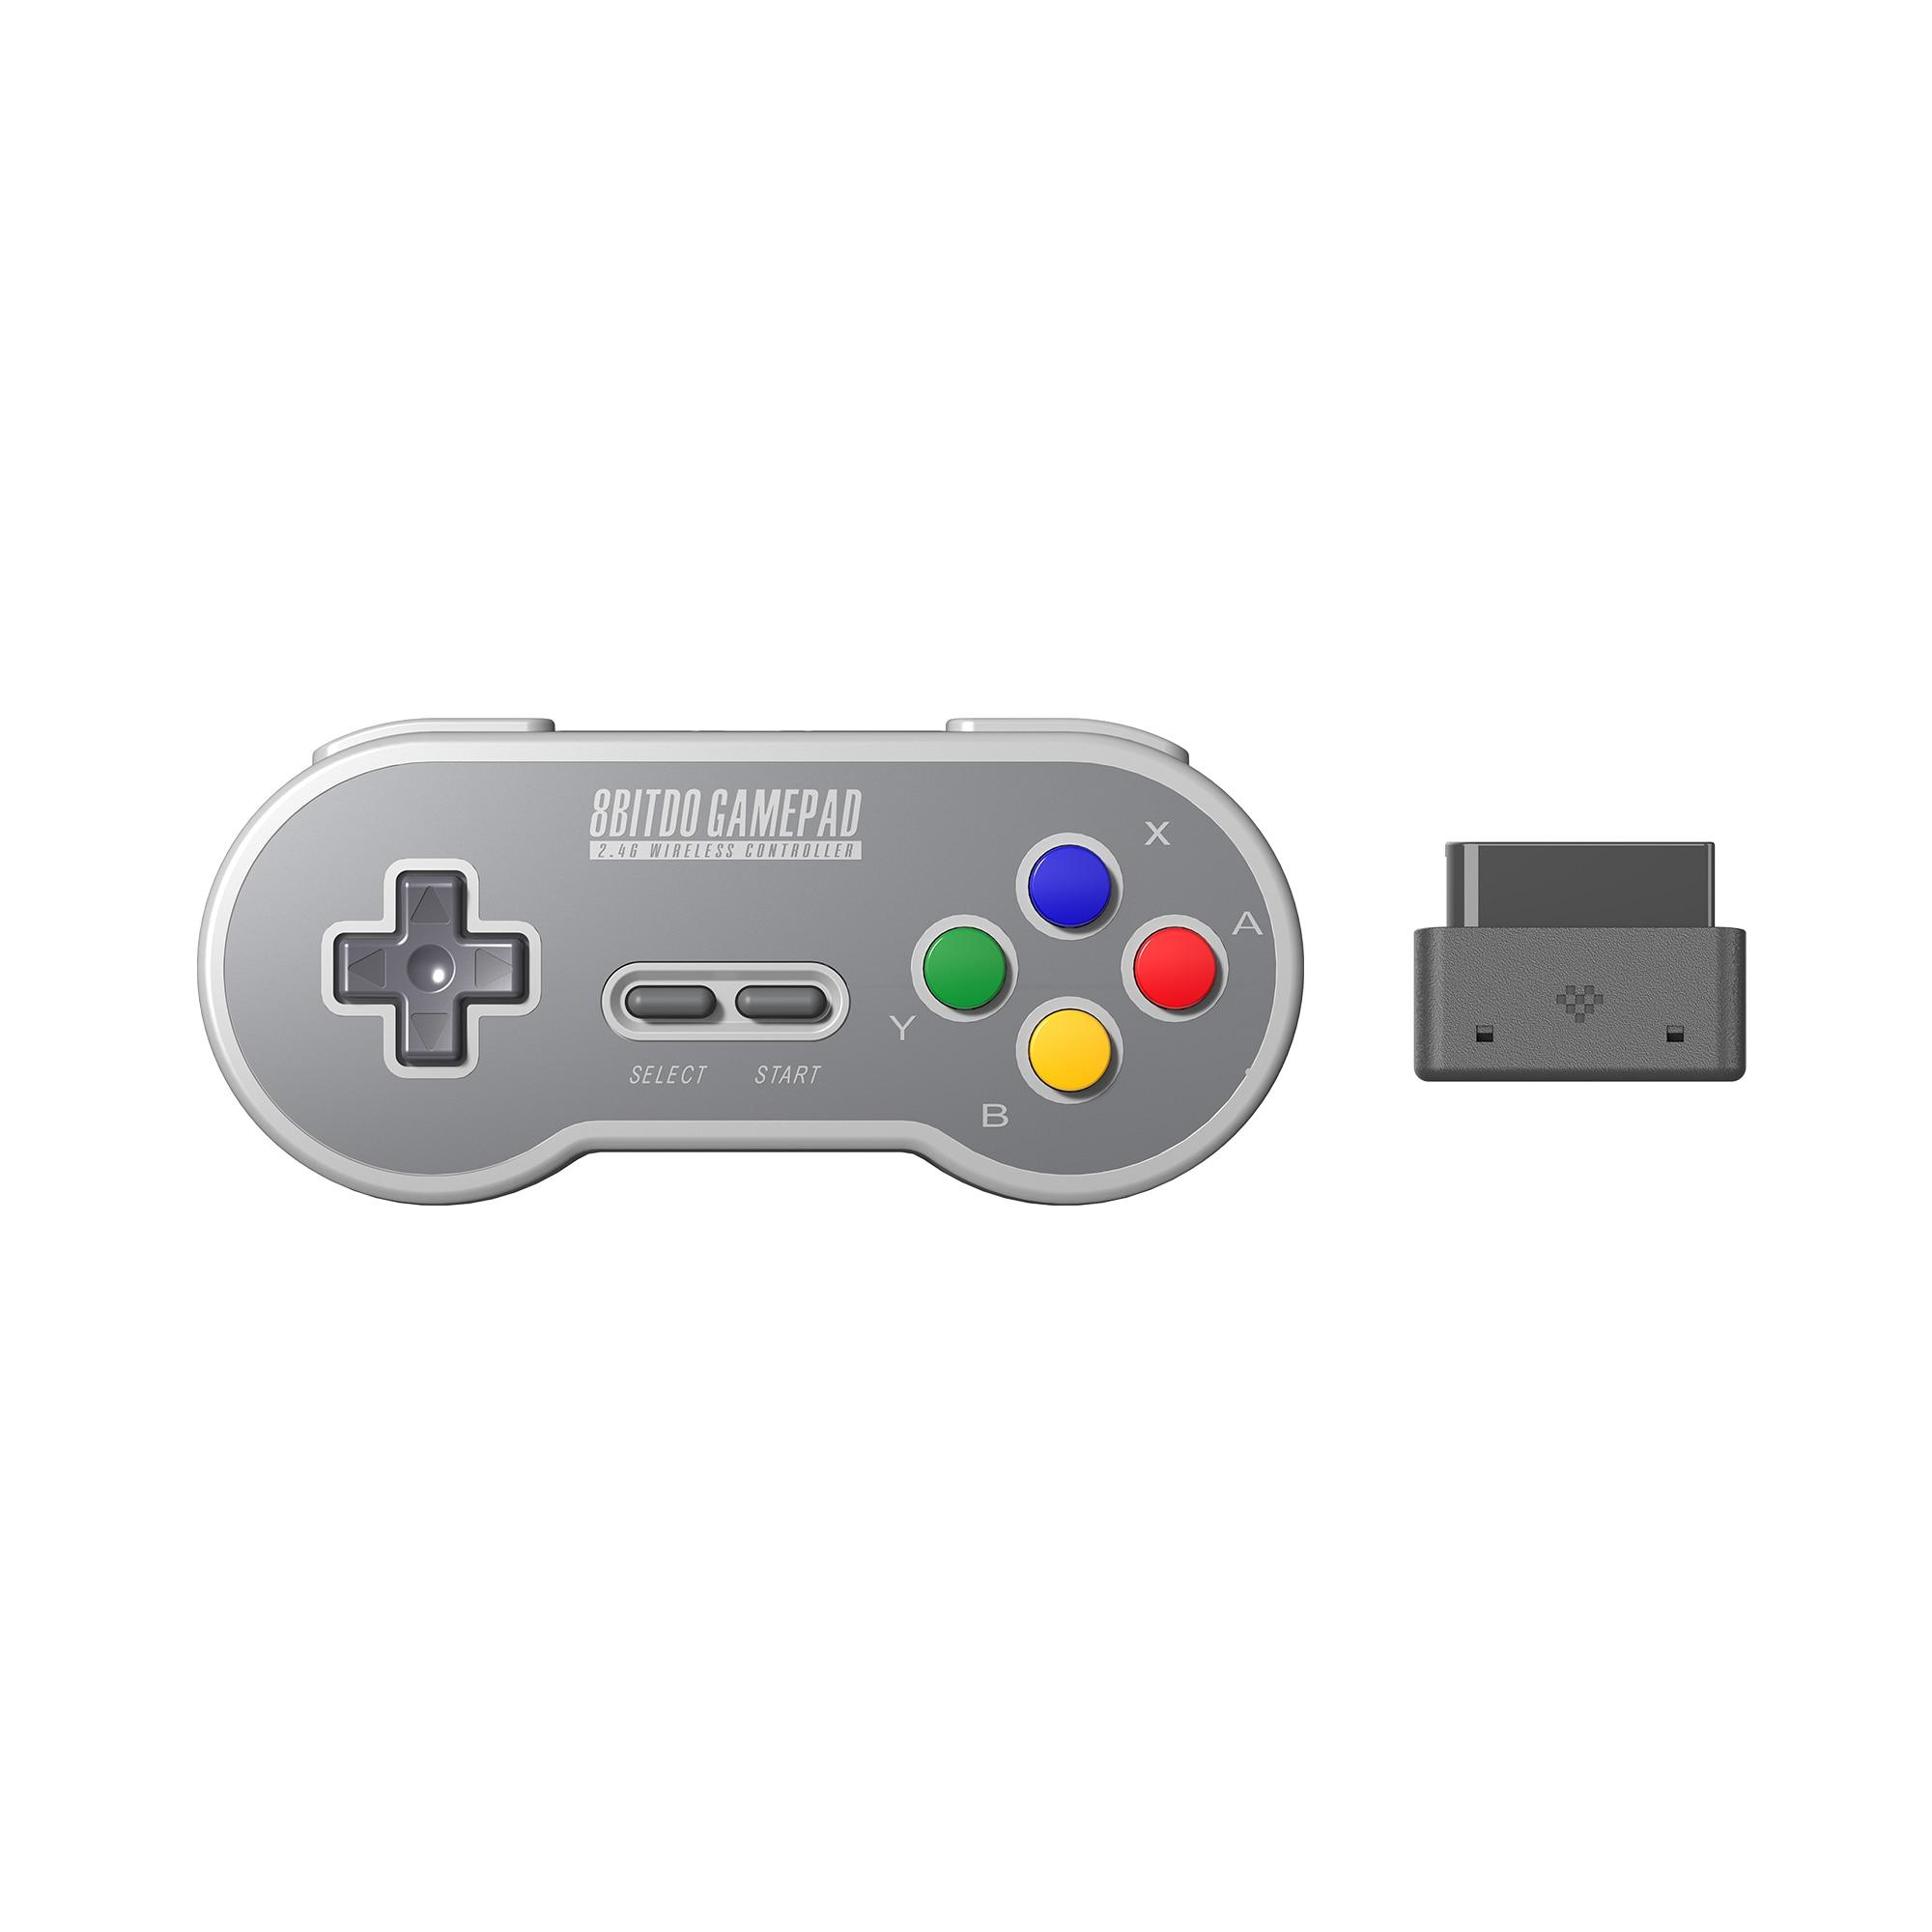 8BitDo SN30 2.4G Wireless Gamepad for Original SNES/S FC (SN Edition) - Super NES